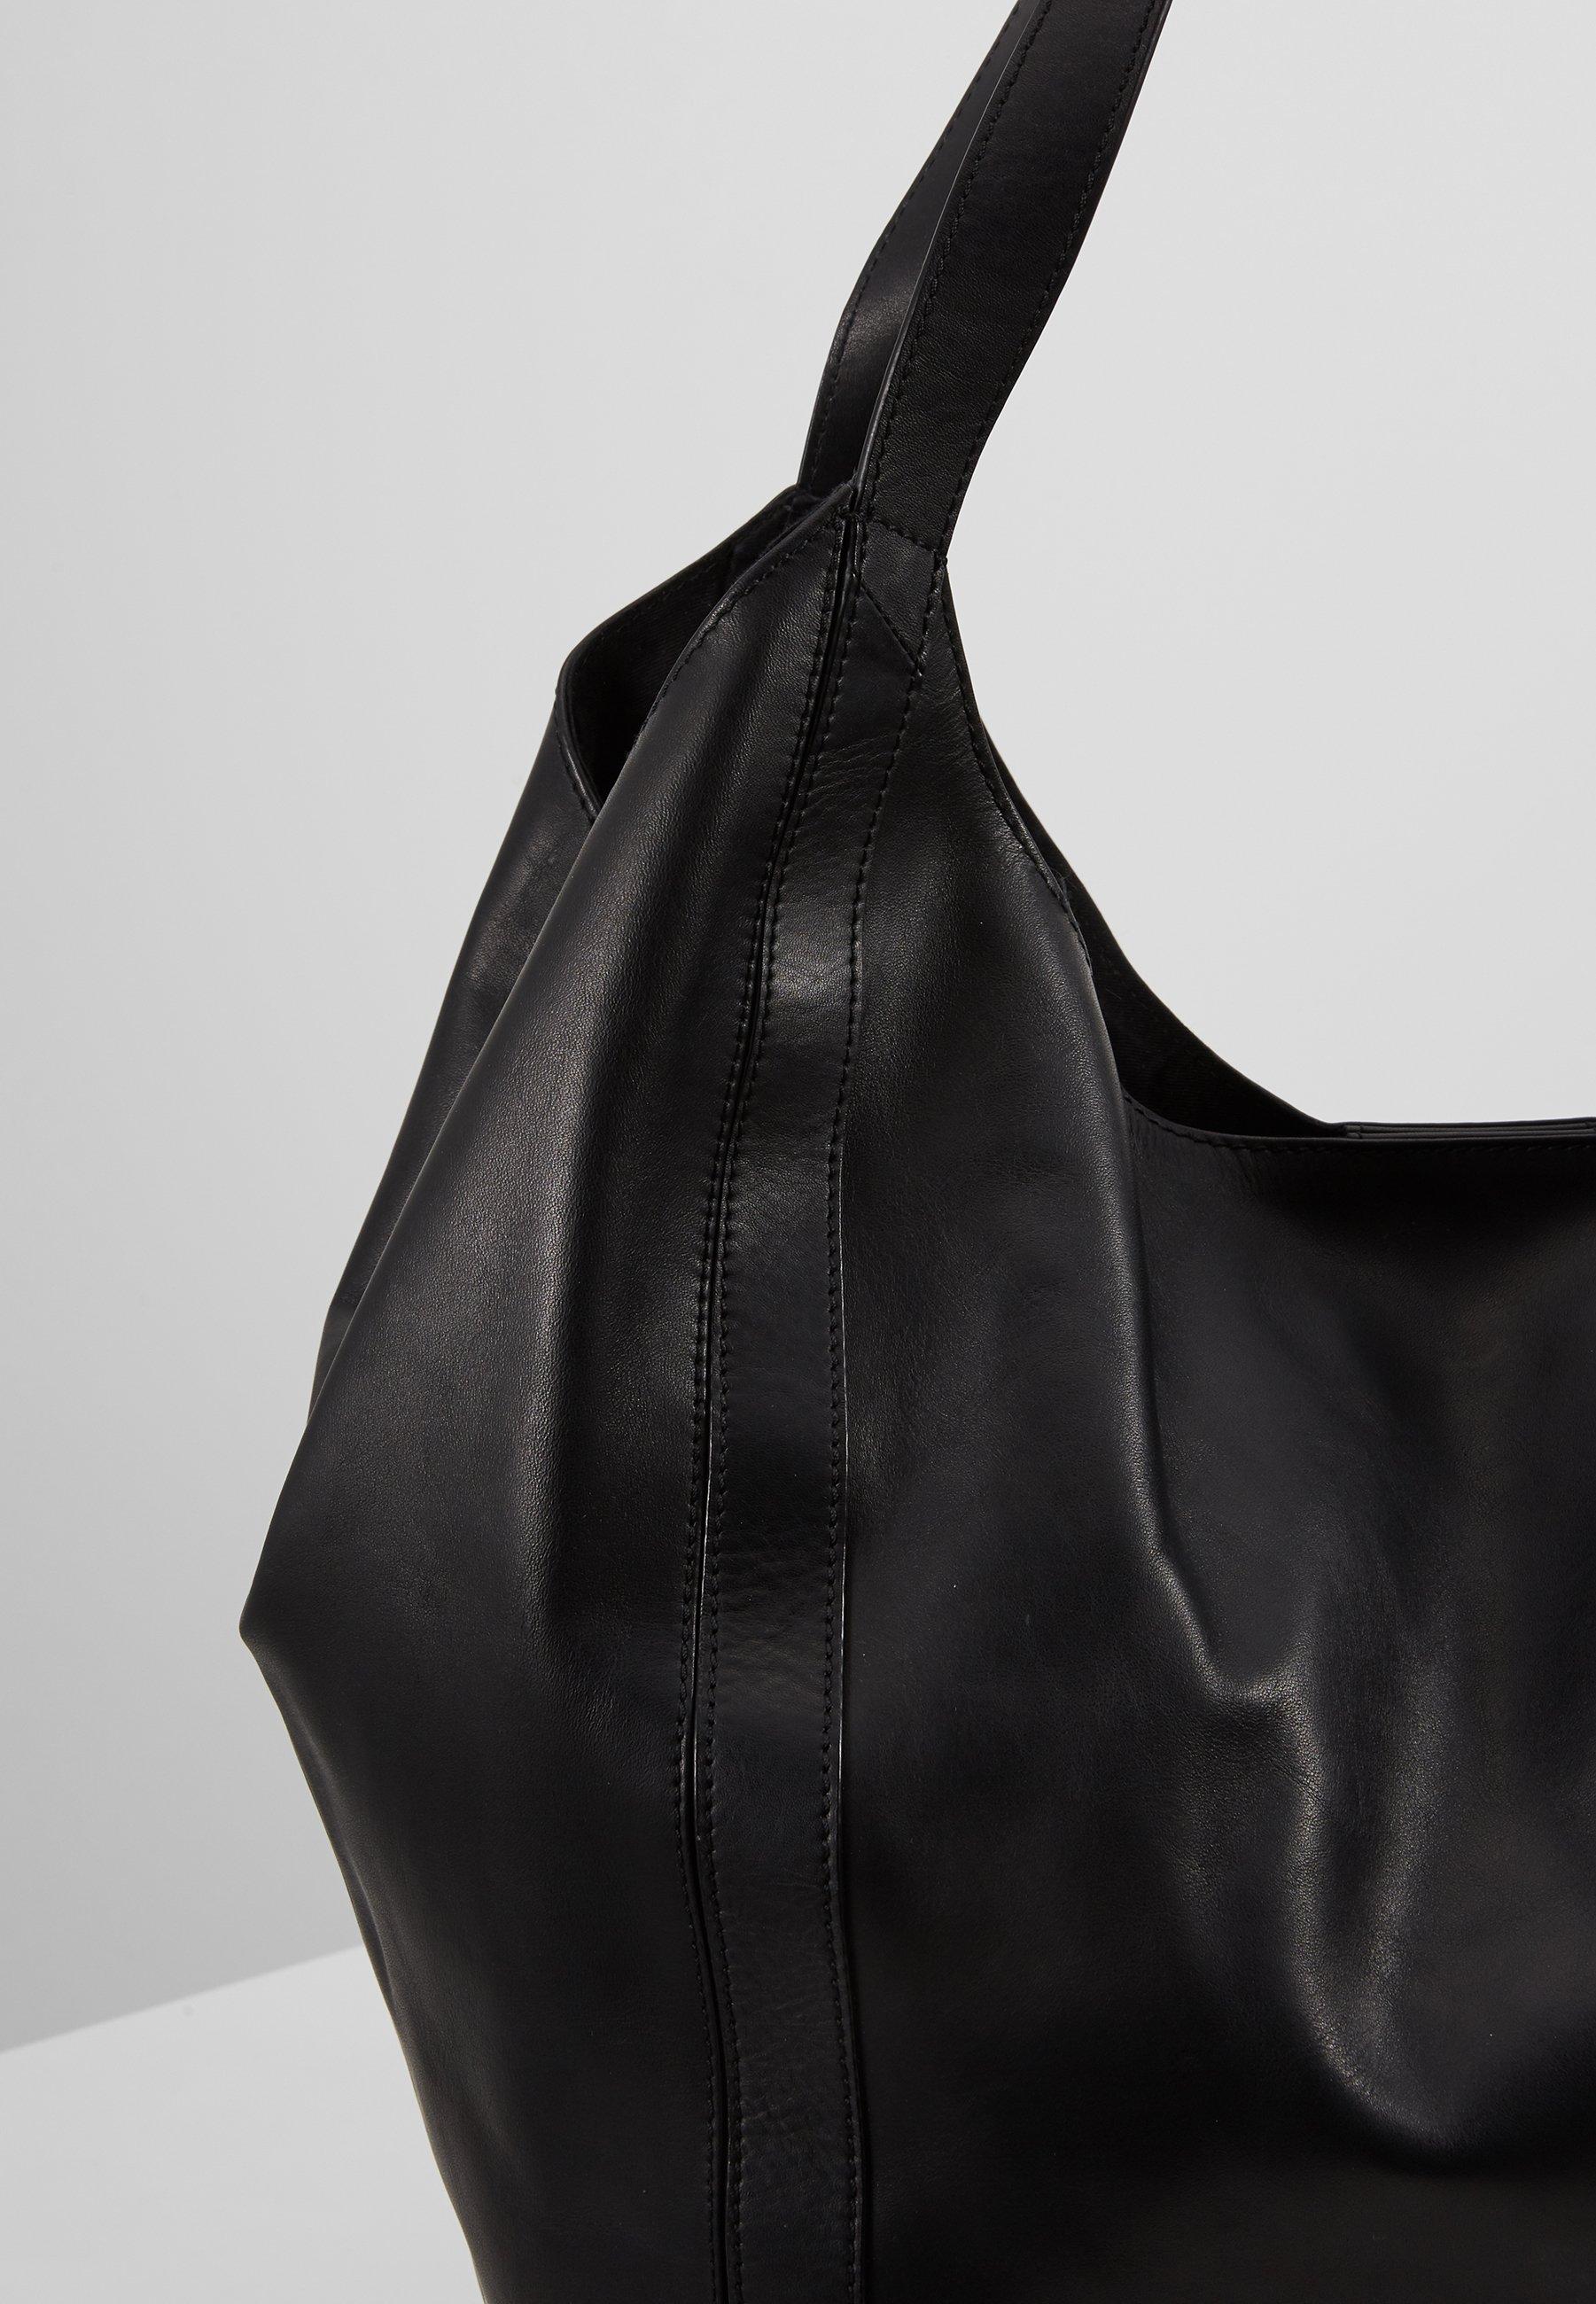 Becksöndergaard Veg Malik Bag - Handtasche Black/schwarz